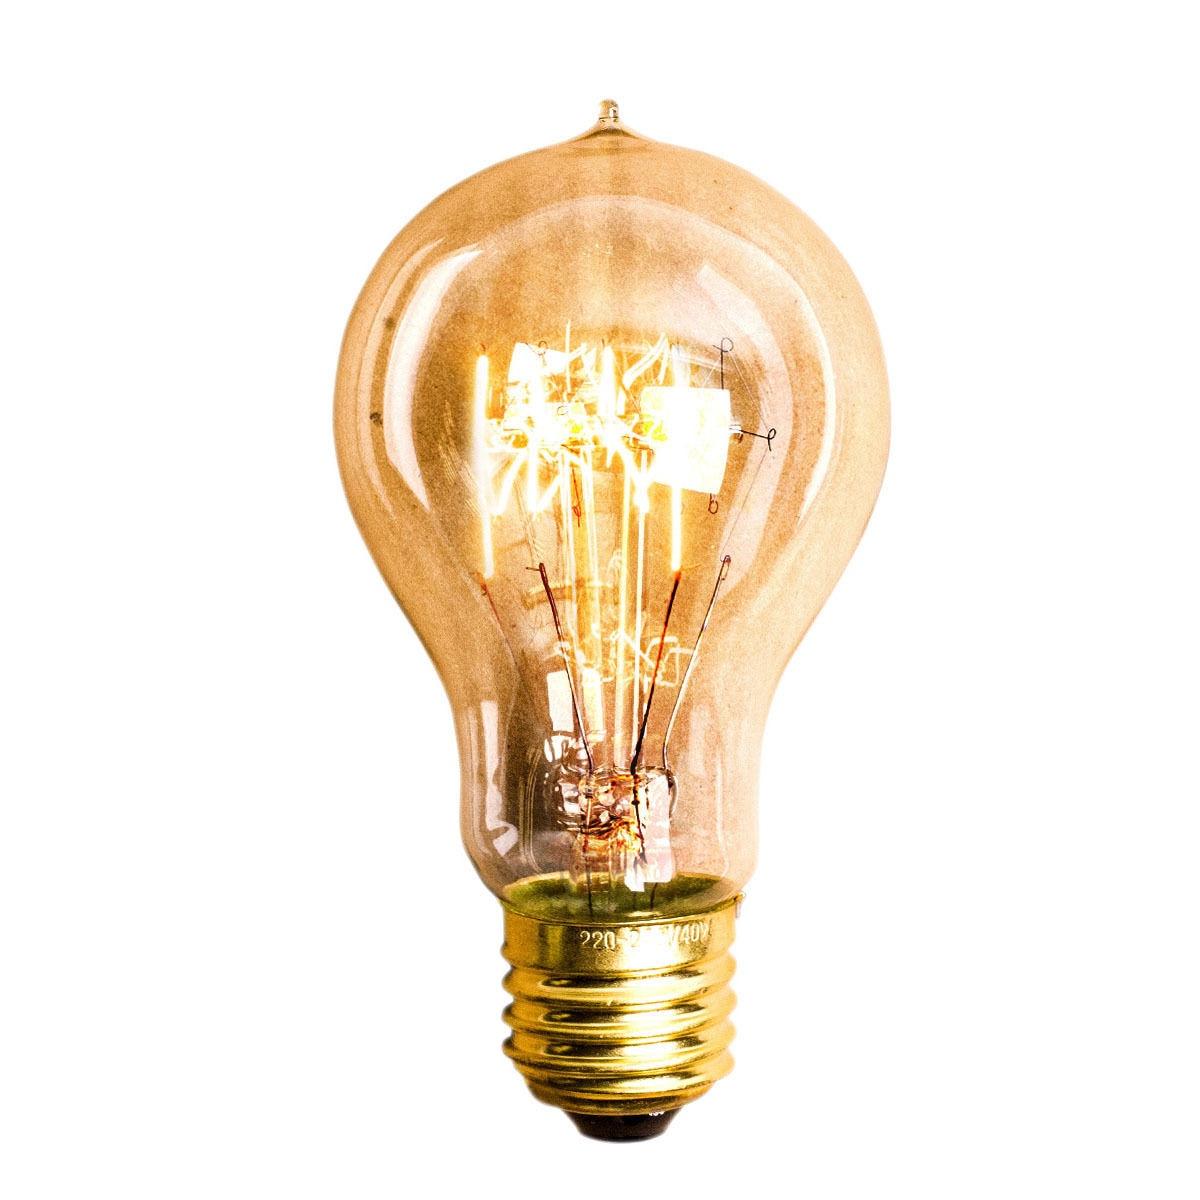 60W Filament Light Bulbs Vintage Retro Incandescent Bulbs Industrial Style Edison Lighting LampSize:E27